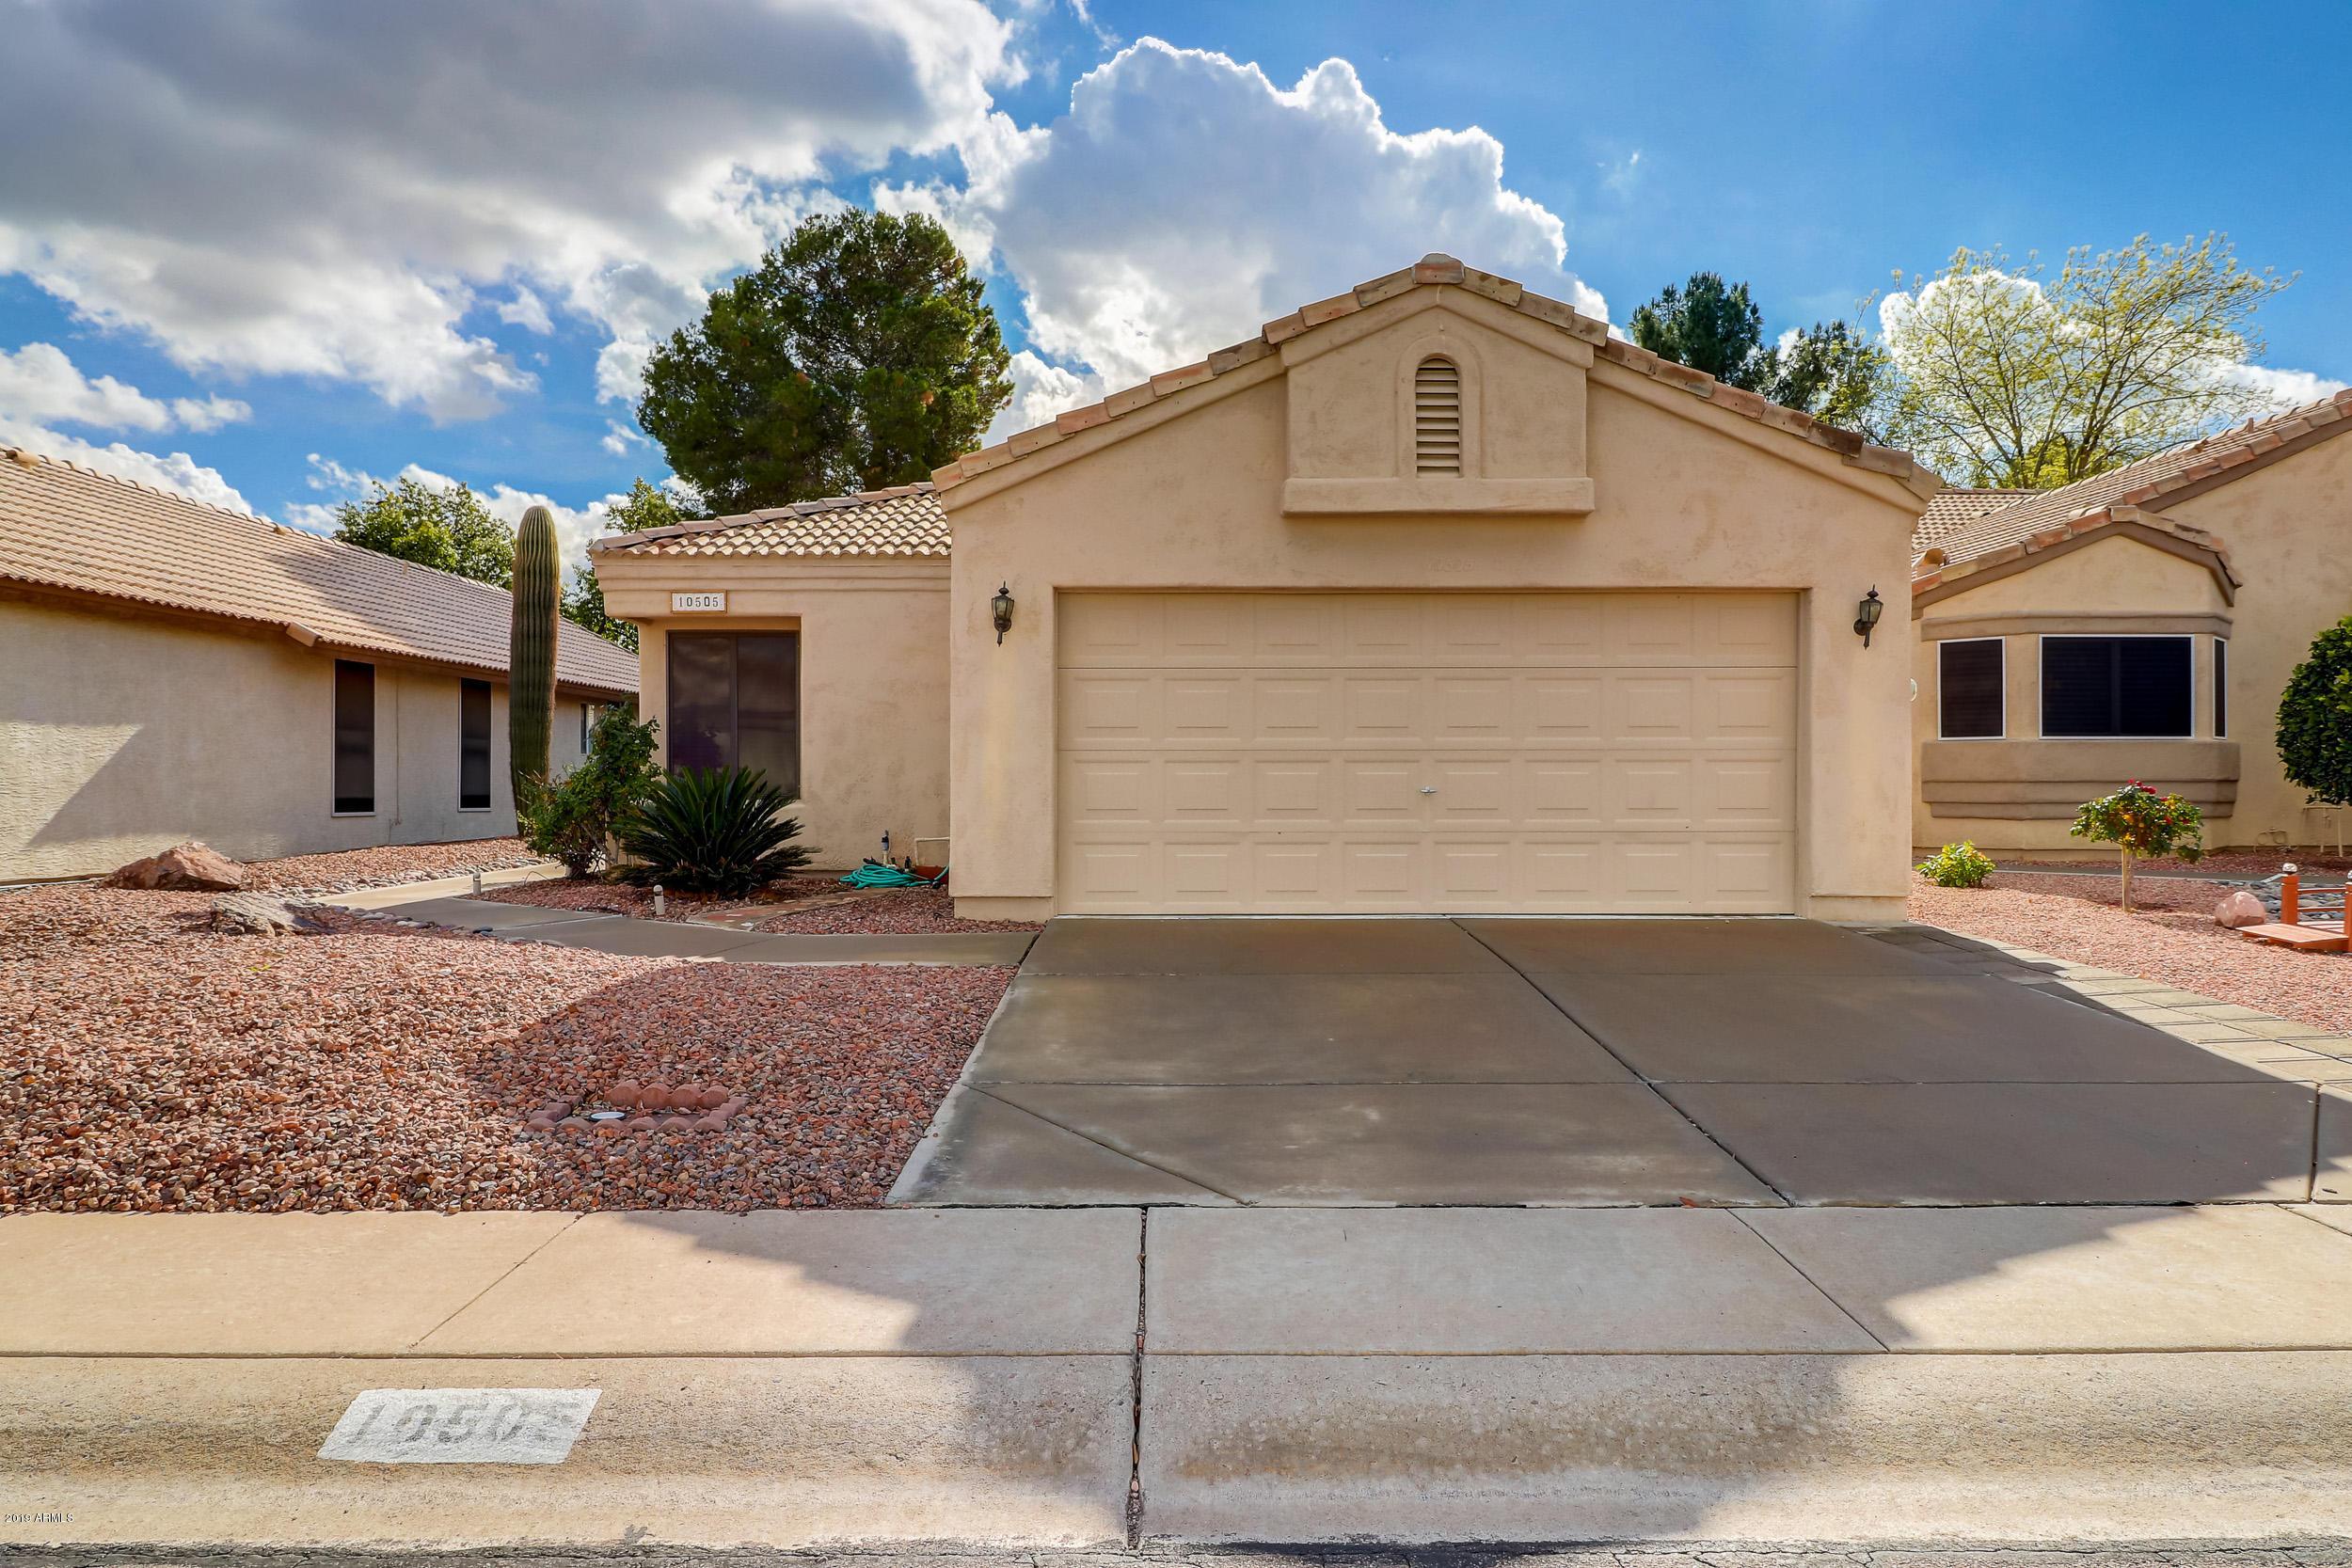 Photo of 10505 W TONOPAH Drive, Peoria, AZ 85382